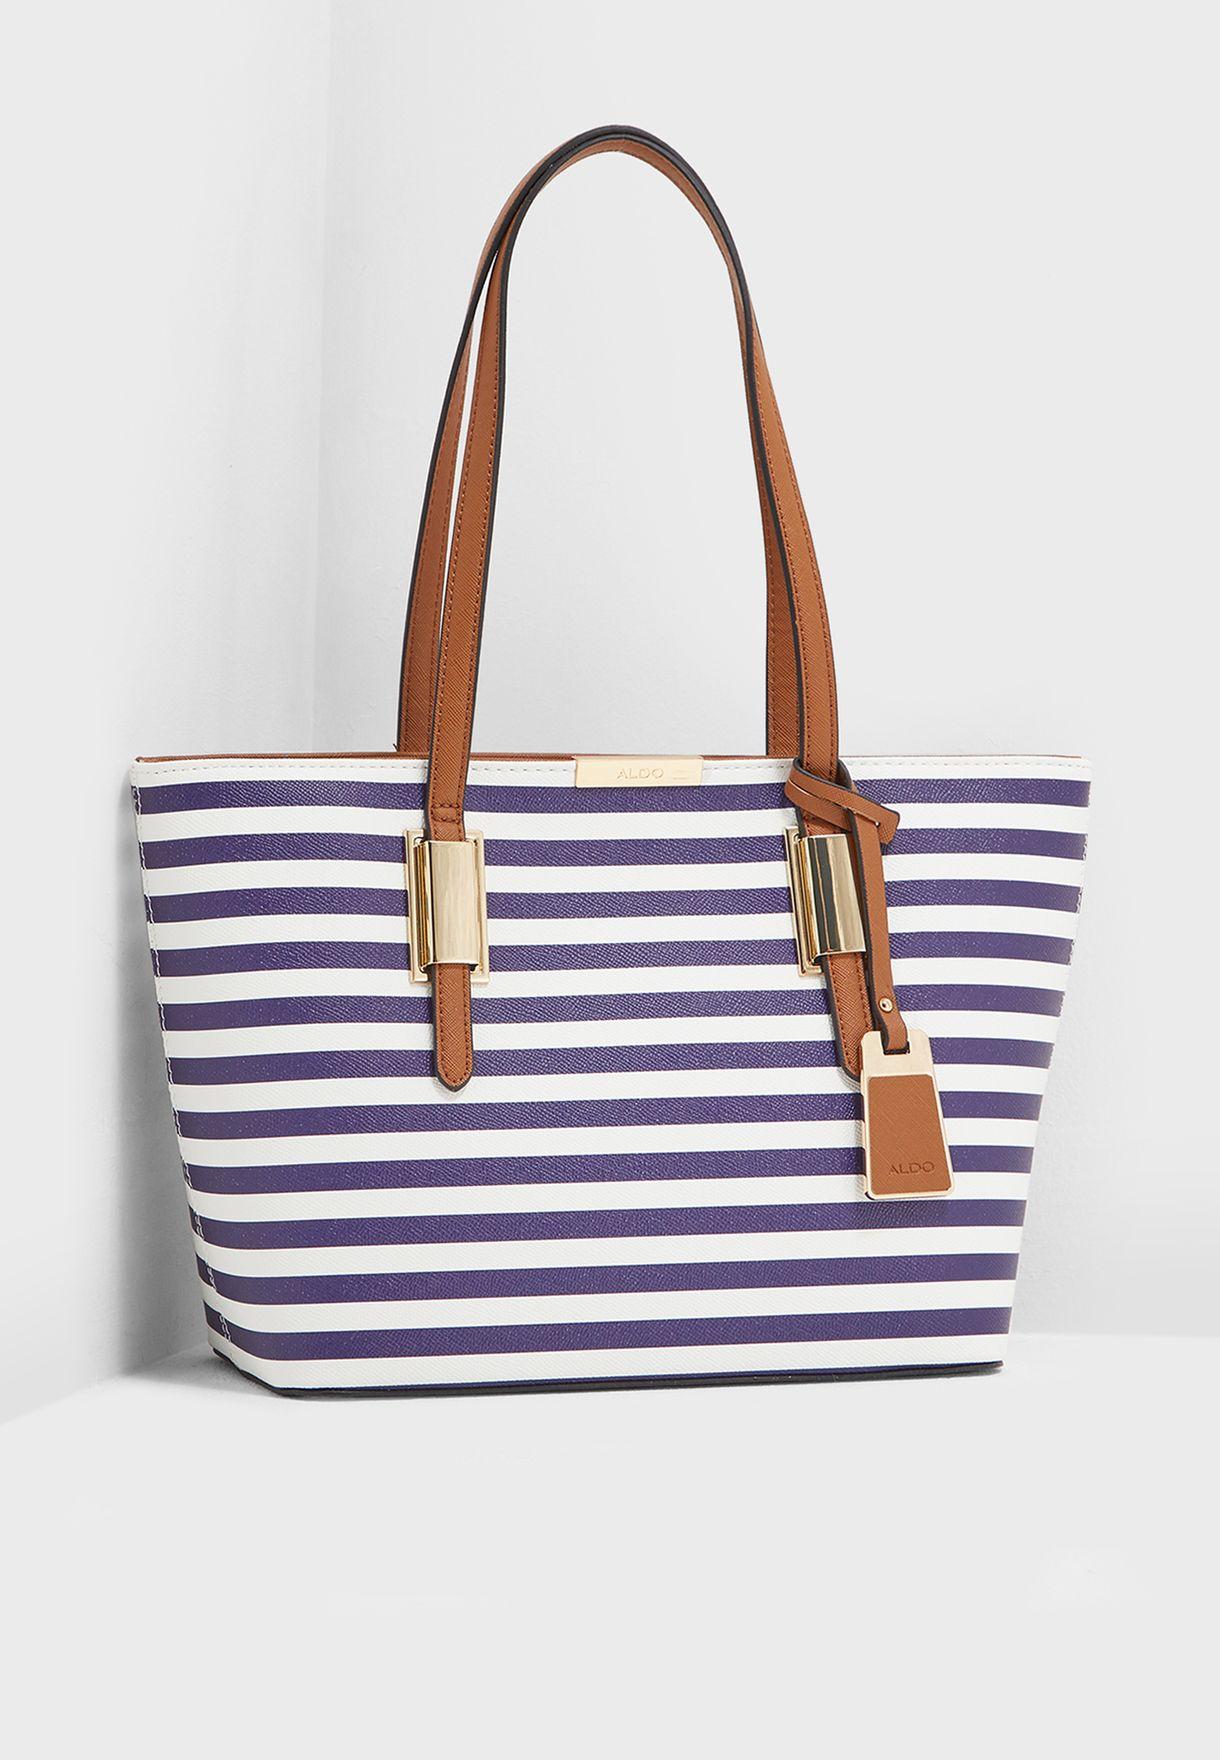 3a56f558c45 Shop Aldo stripes Debonis Tote AFADOLLAA1 for Women in UAE ...